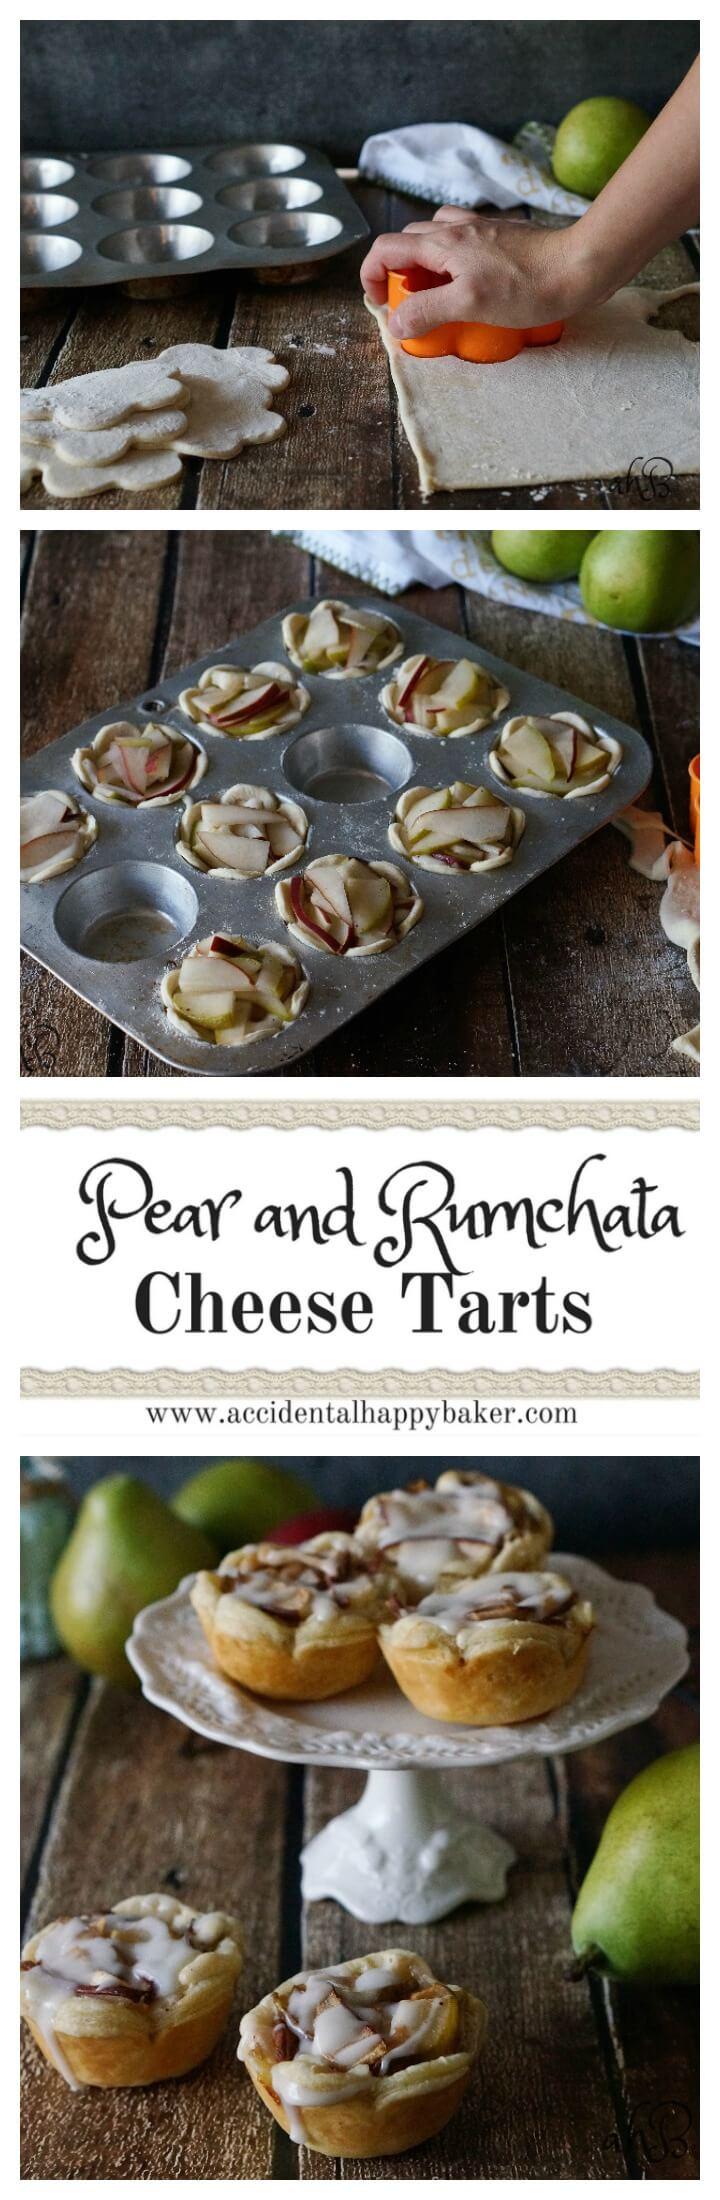 Pear Rumchata Cheese Tarts